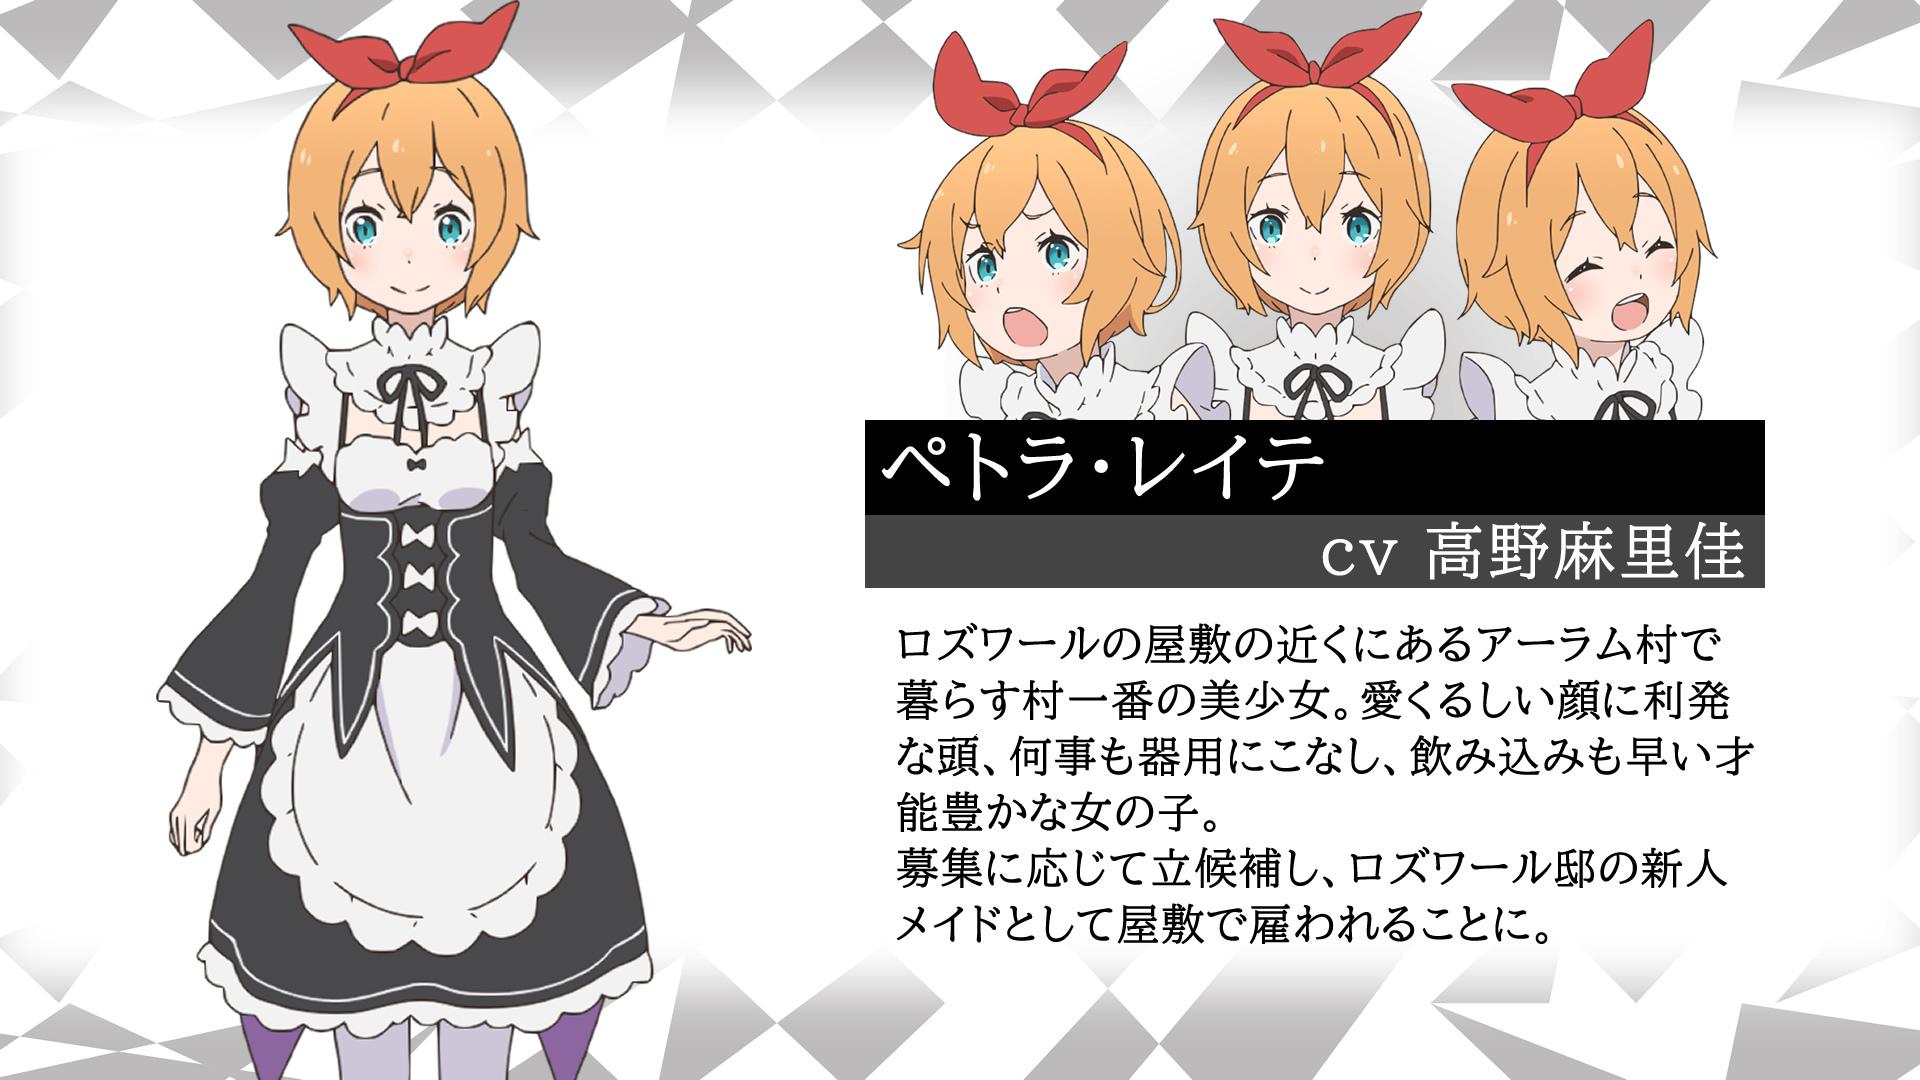 RE从零开始的异世界生活 第二季Rezero_official 1271060488013492224_p0